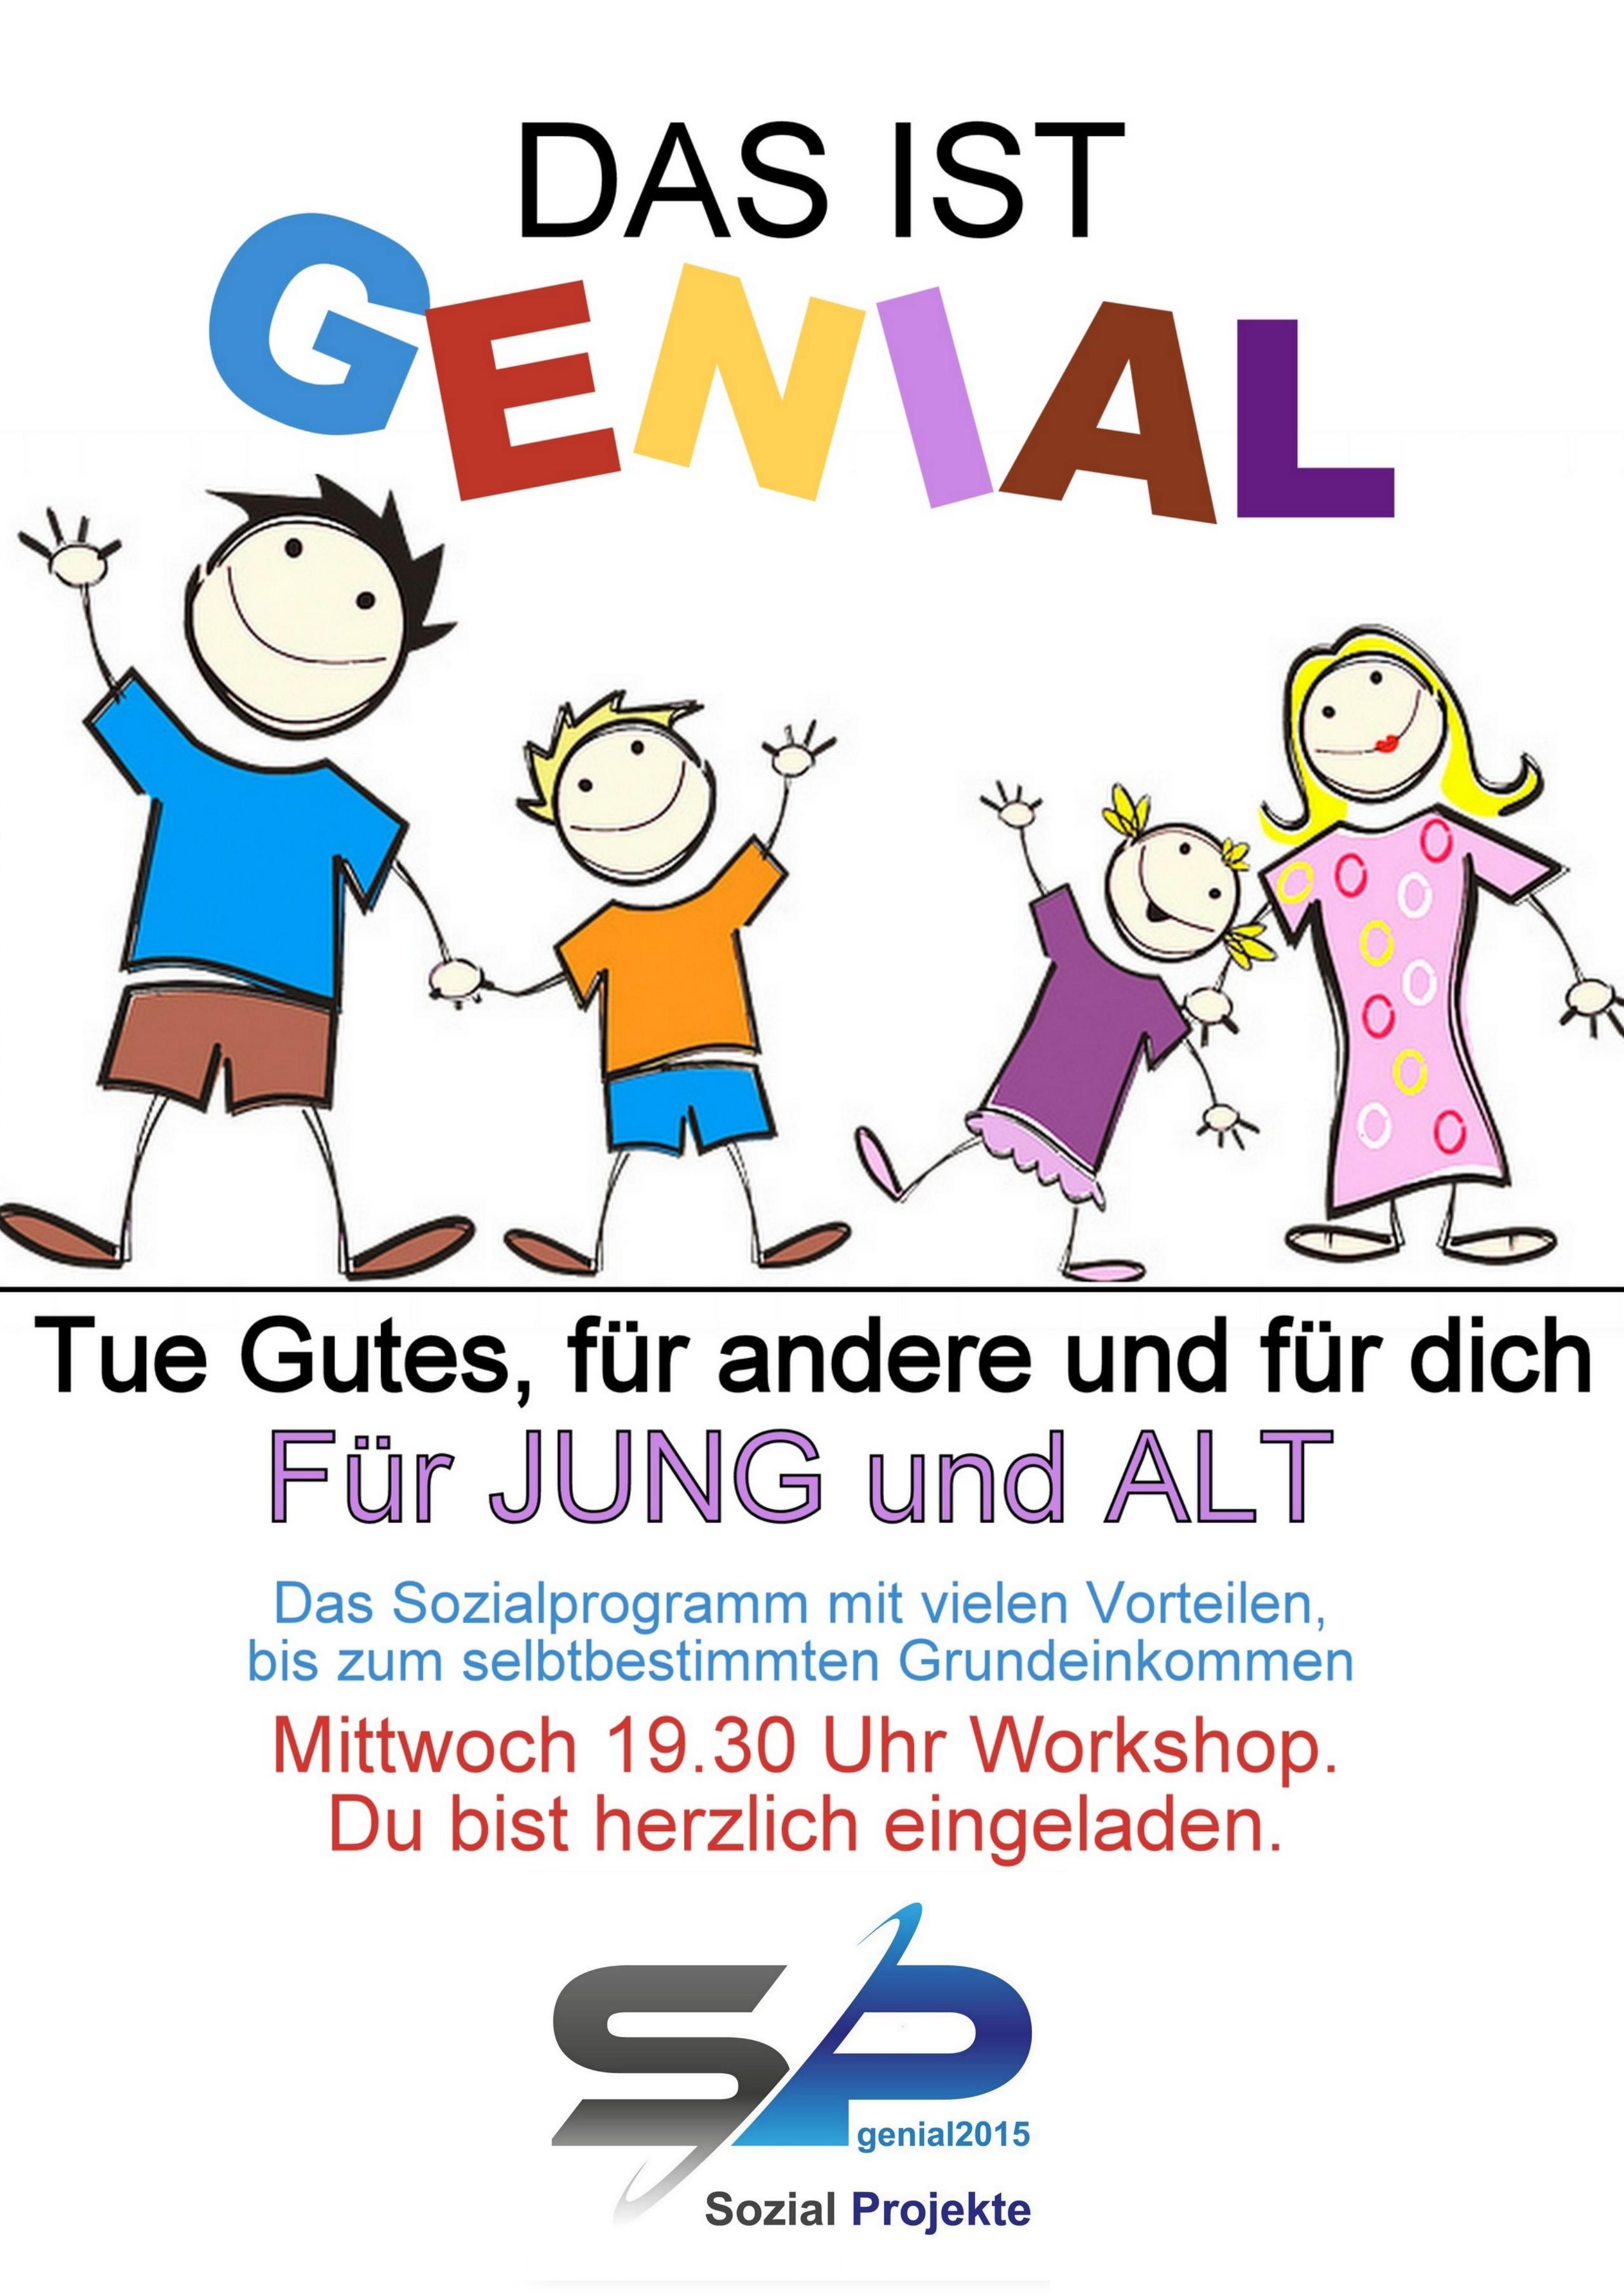 1543175163_Genial20151-003.jpg